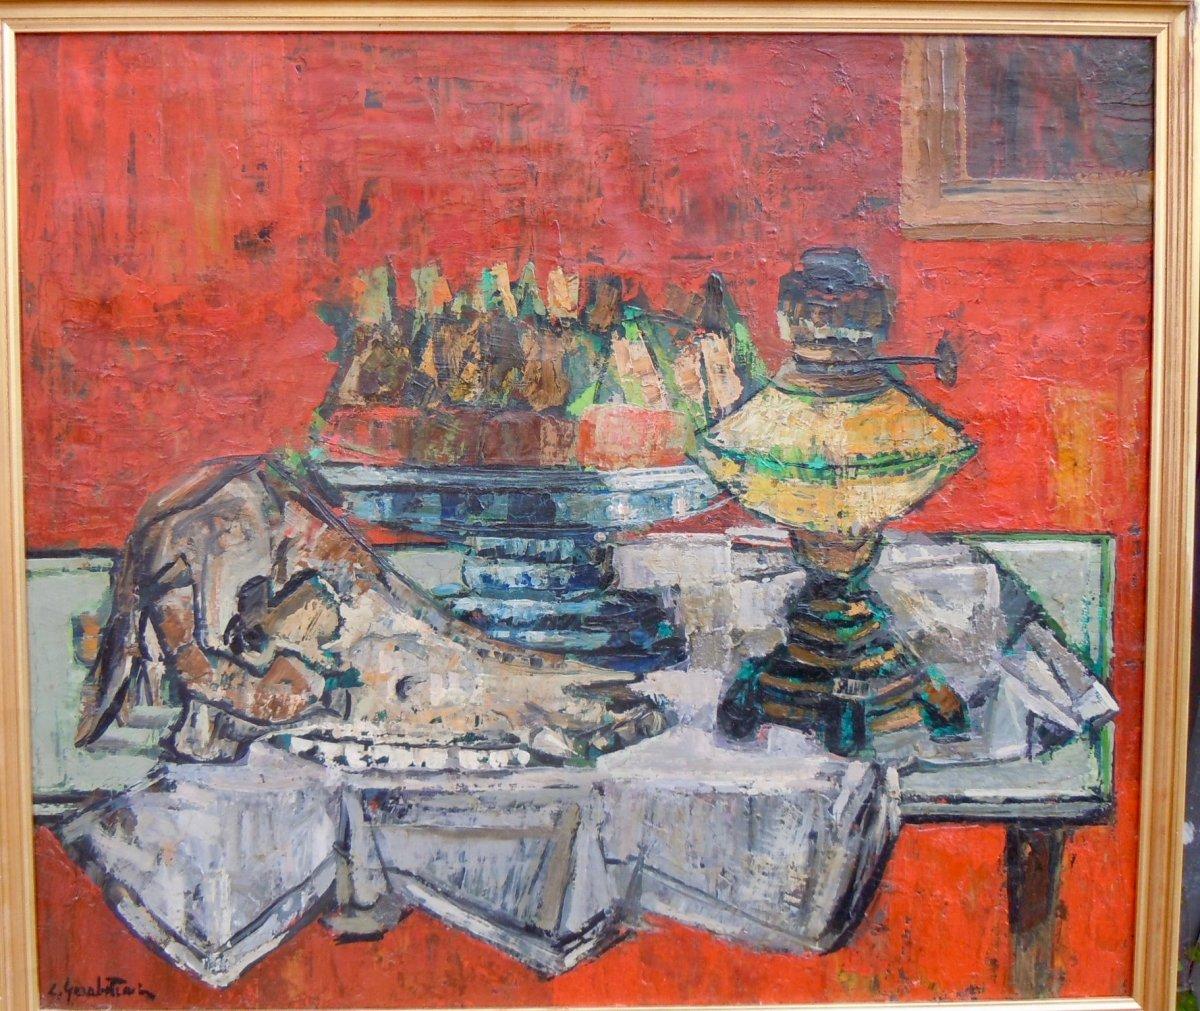 Crikor Garabetian (1908-1993) Still Life Vanity Skull Animal 55x63 Cm Oil On Canvas Signed